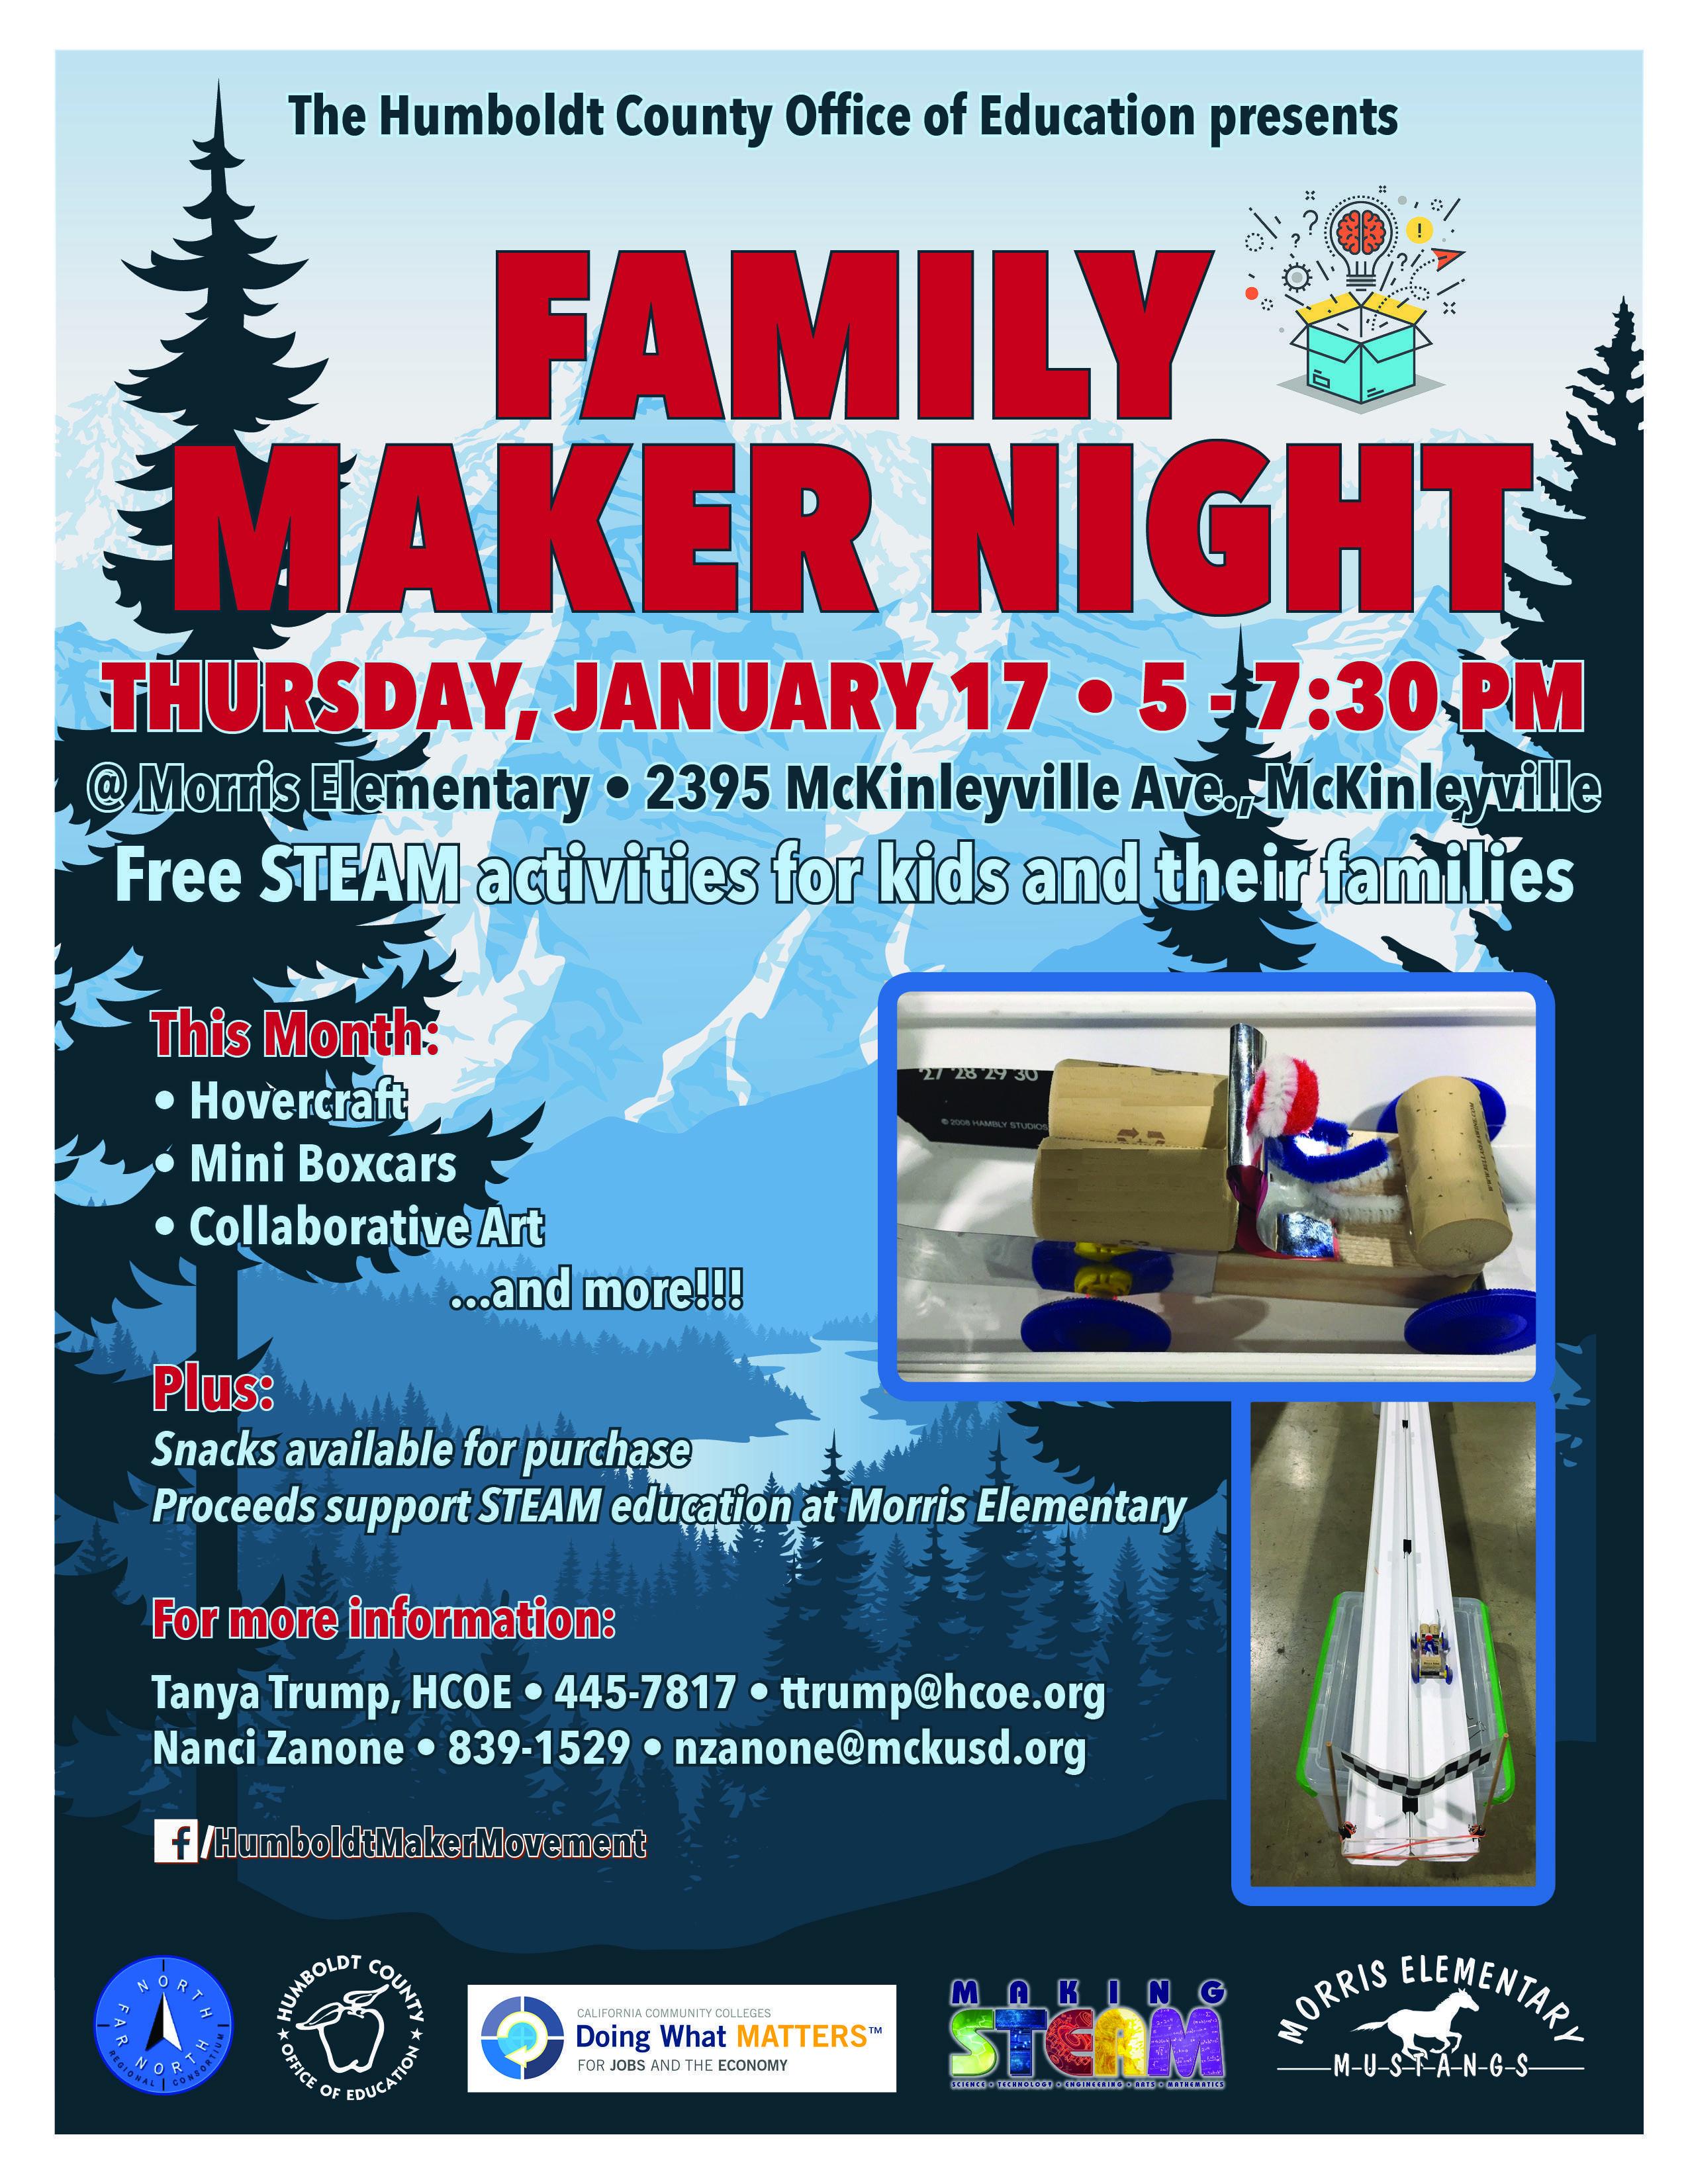 Information Regarding Family Maker Night on January 17th from 5:00-7:30 at Morris.